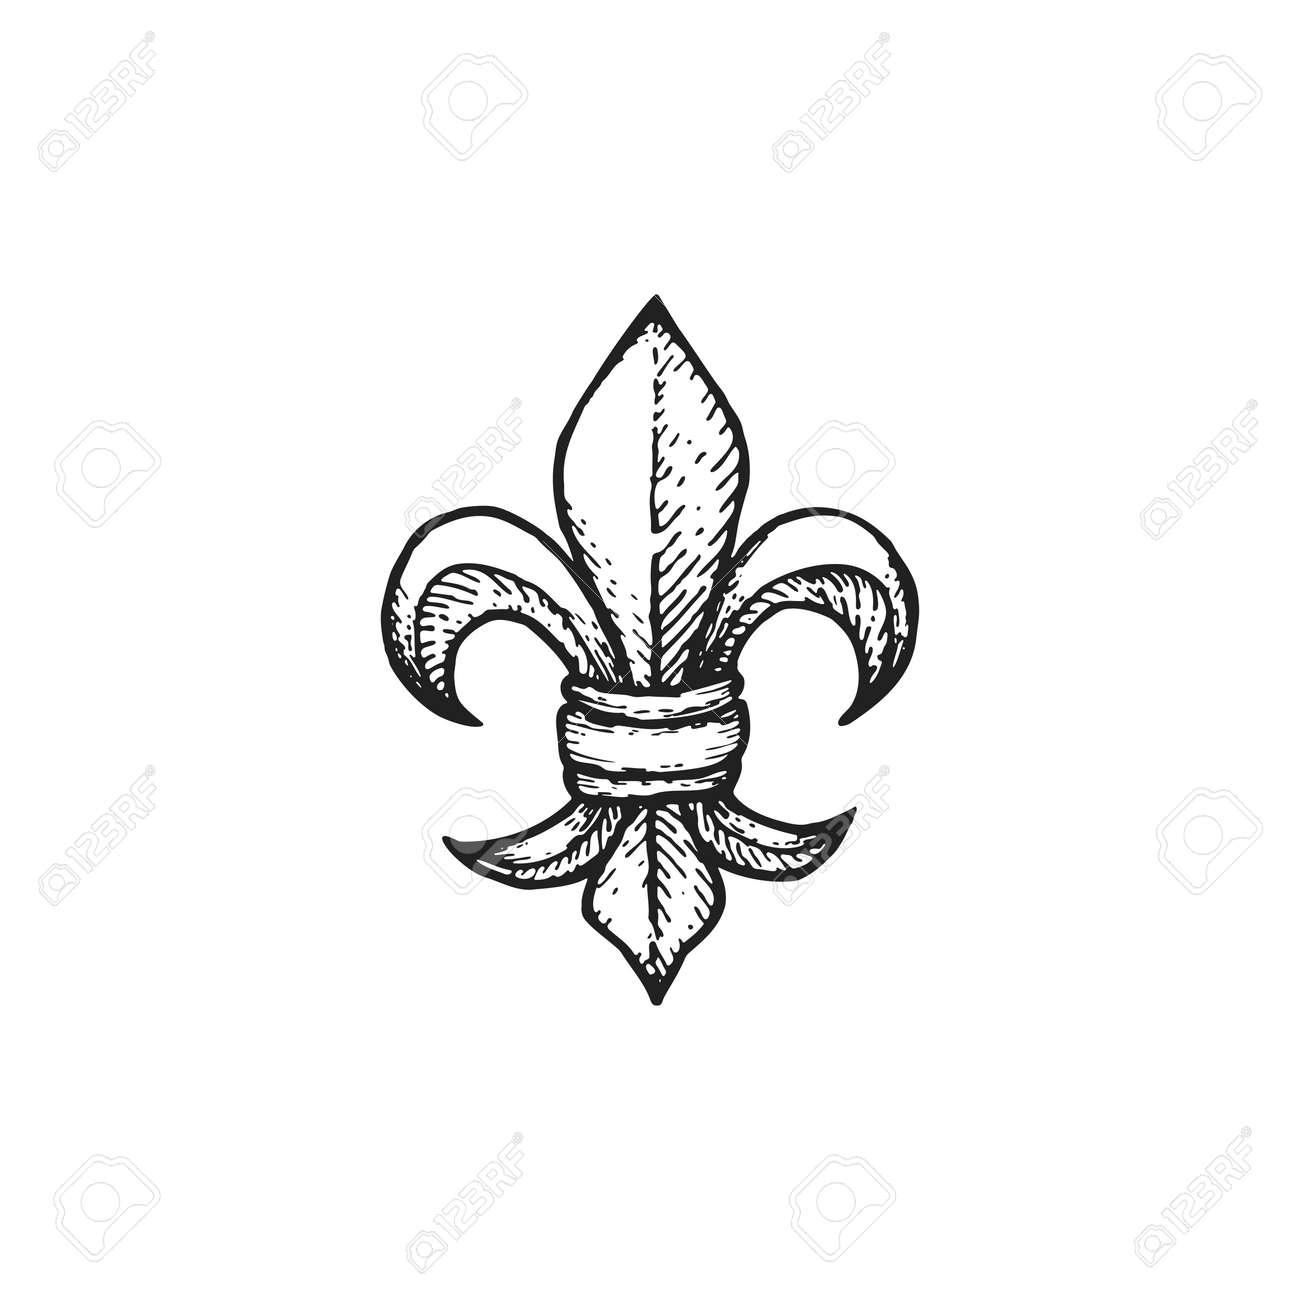 vector black work tattoo dot art hand drawn engraving fleur de rh 123rf com fleur de lys vector art fleur de lis vector free